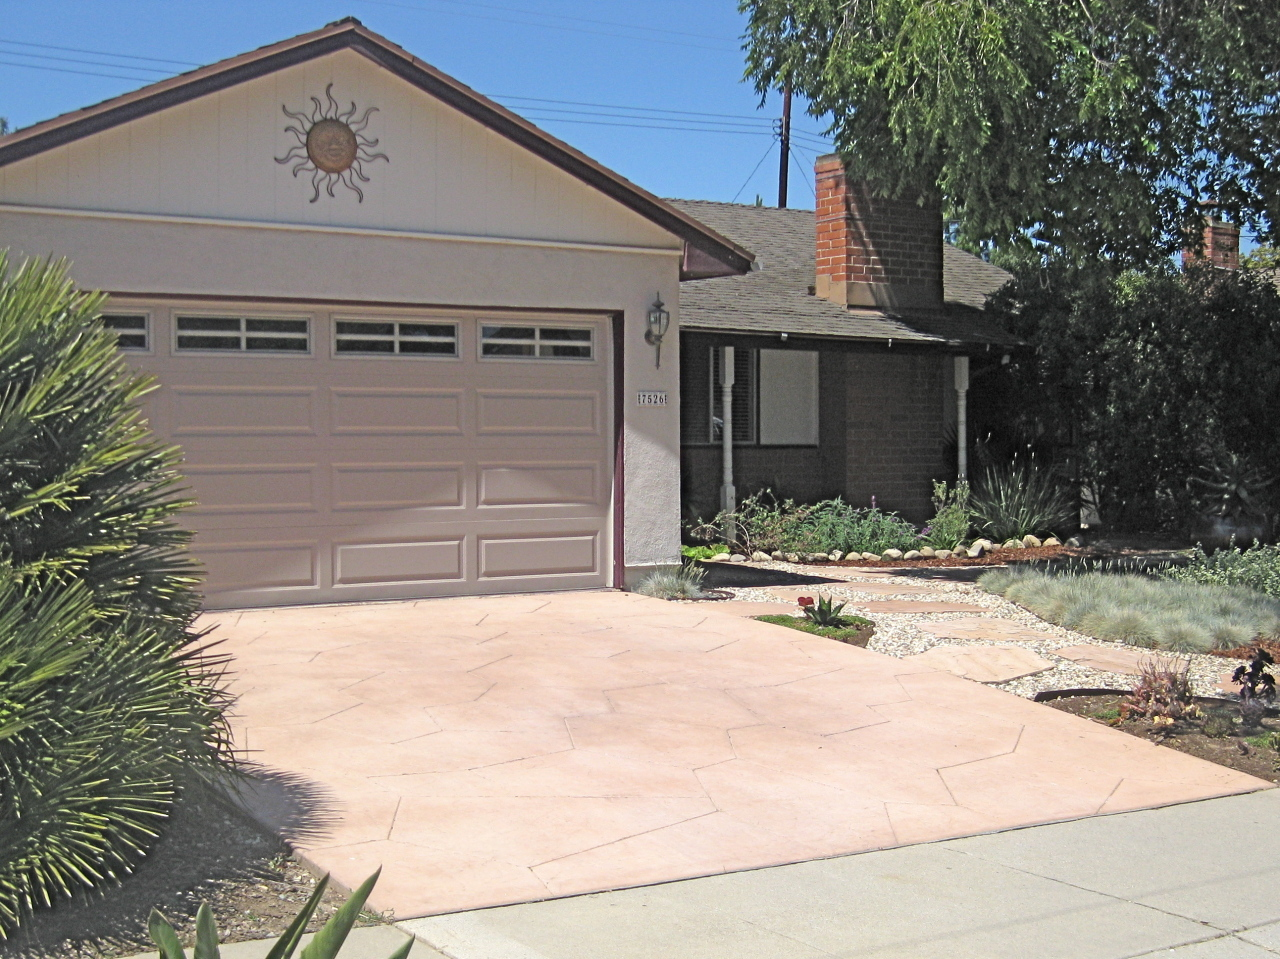 Property photo for 7526 Newport DR Goleta, California 93117 - 11-2230